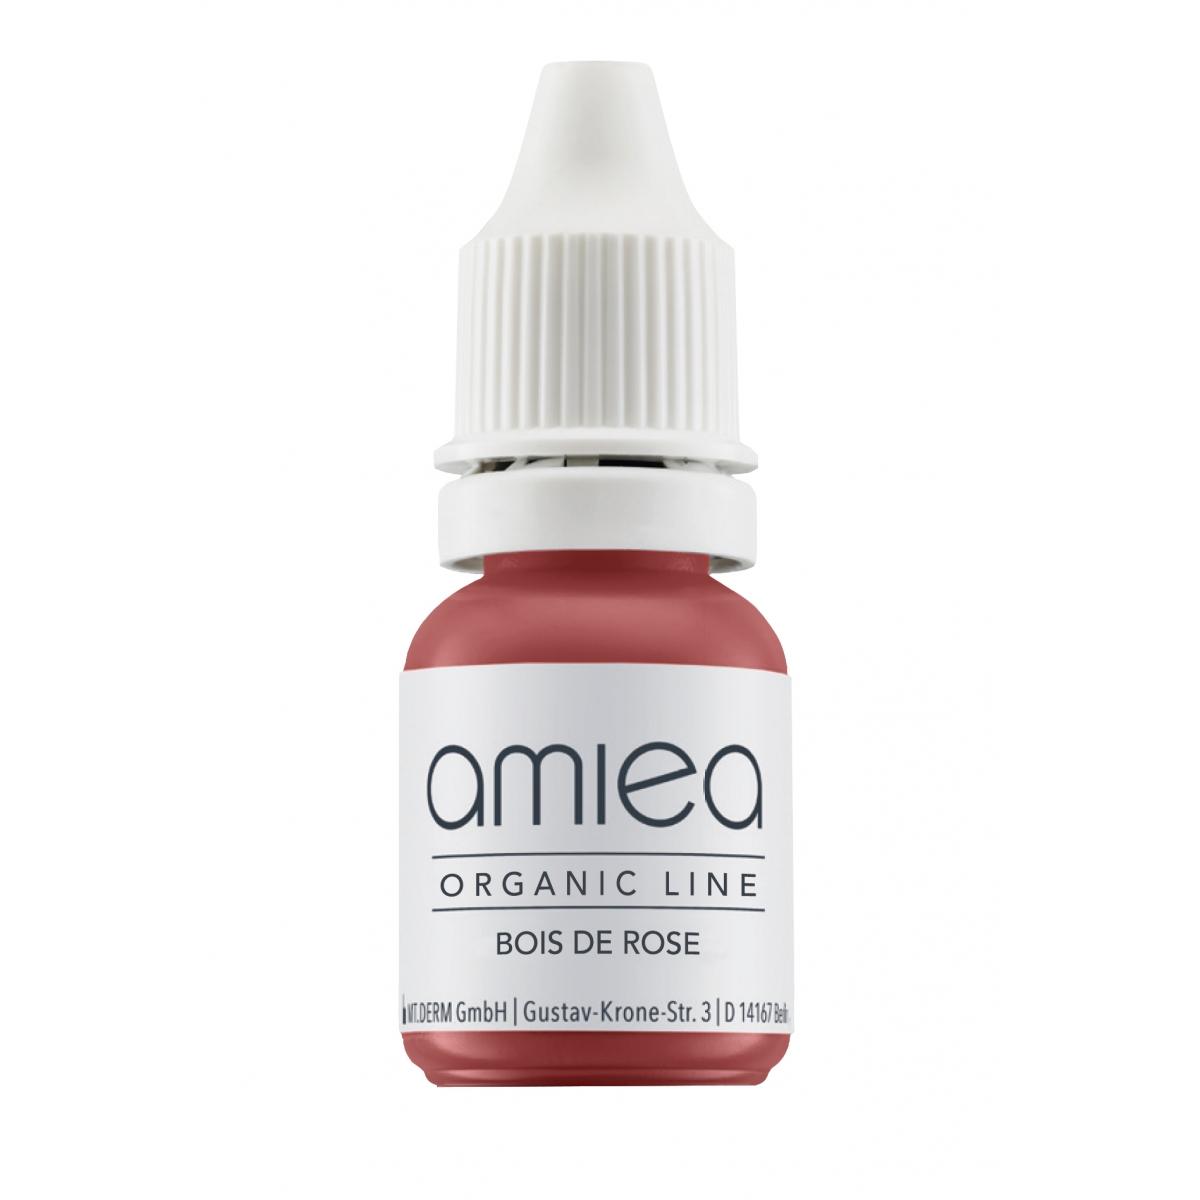 Organicline (10 ml) - PIGMENTS AMIEA ORGANICLINE BOIS DE ROSE, Flacon 10 ml